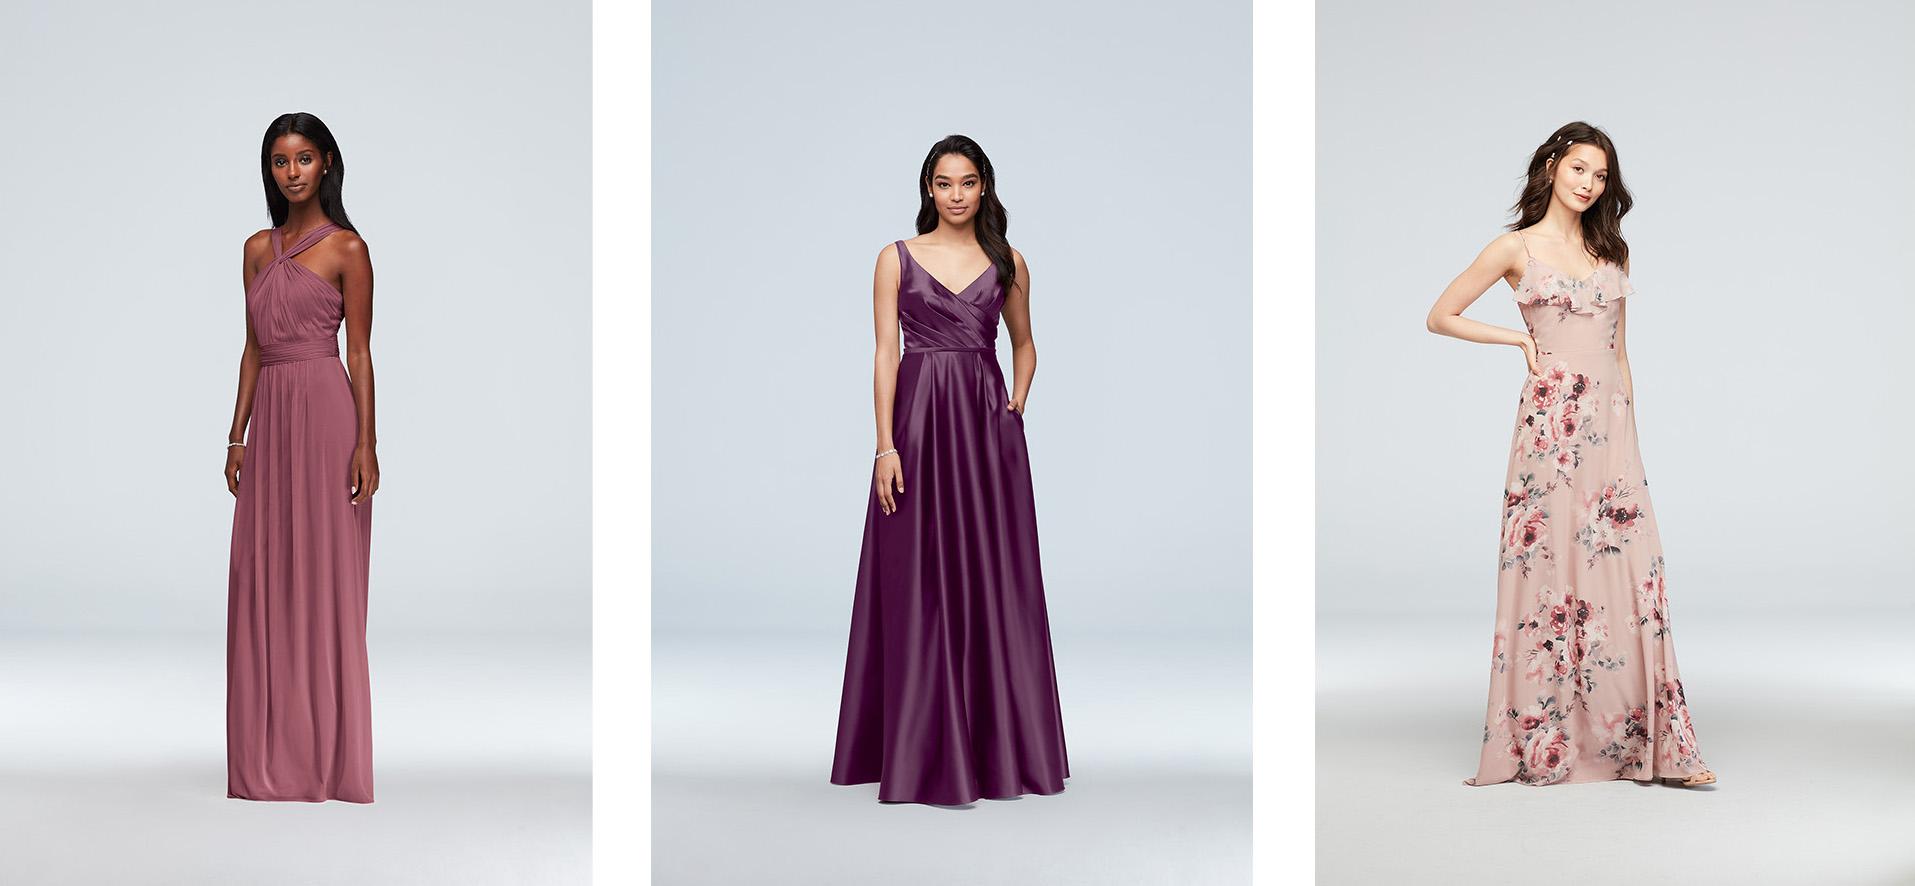 Three bridesmaid dresses